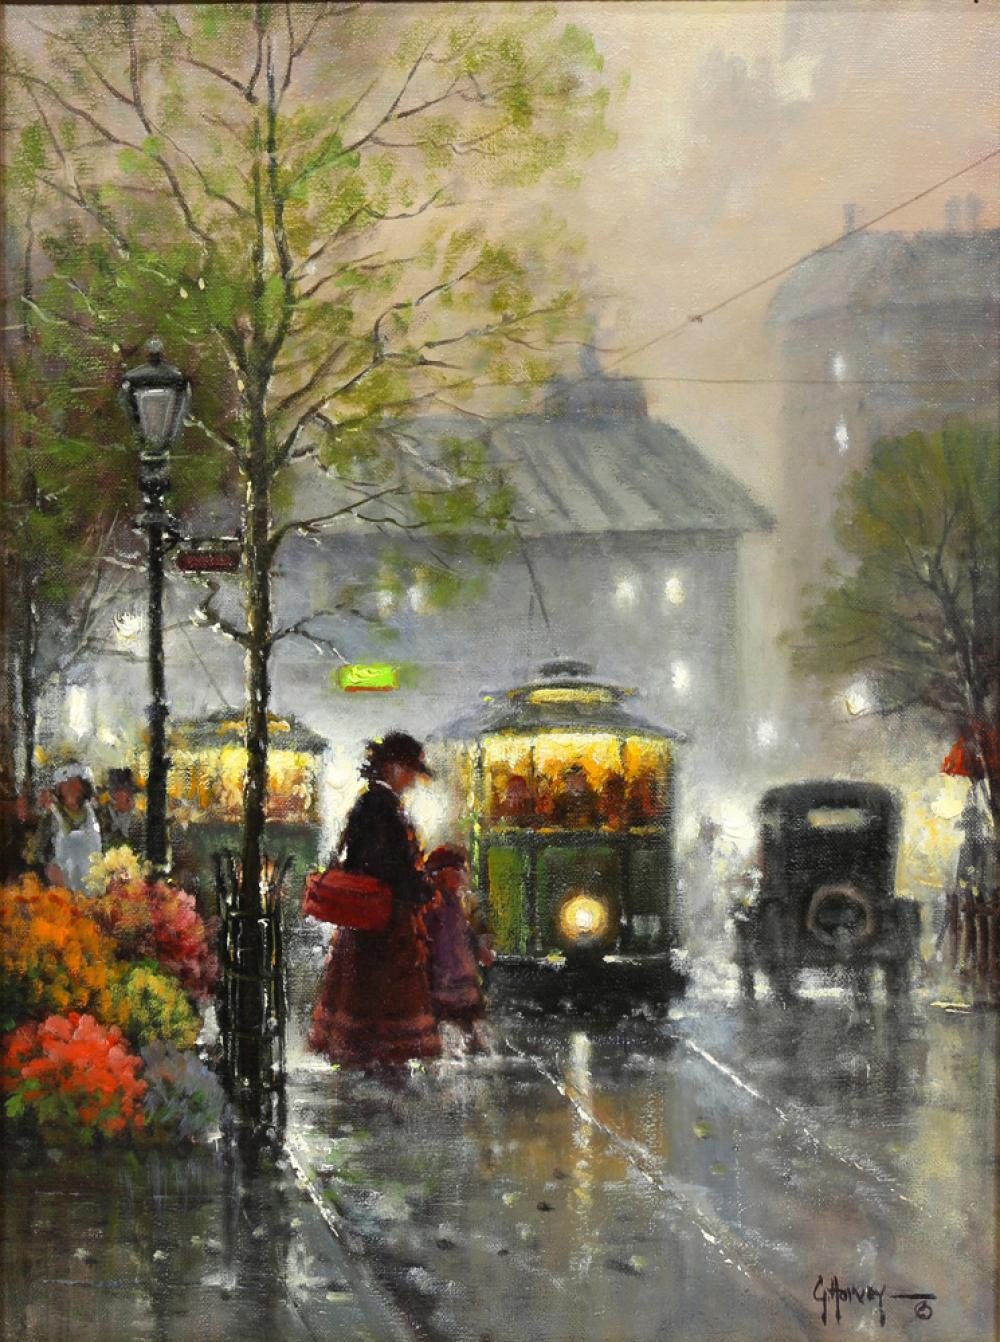 Sold Price Painting G Gerald Harvey Jones Harvey Invalid Date Pst